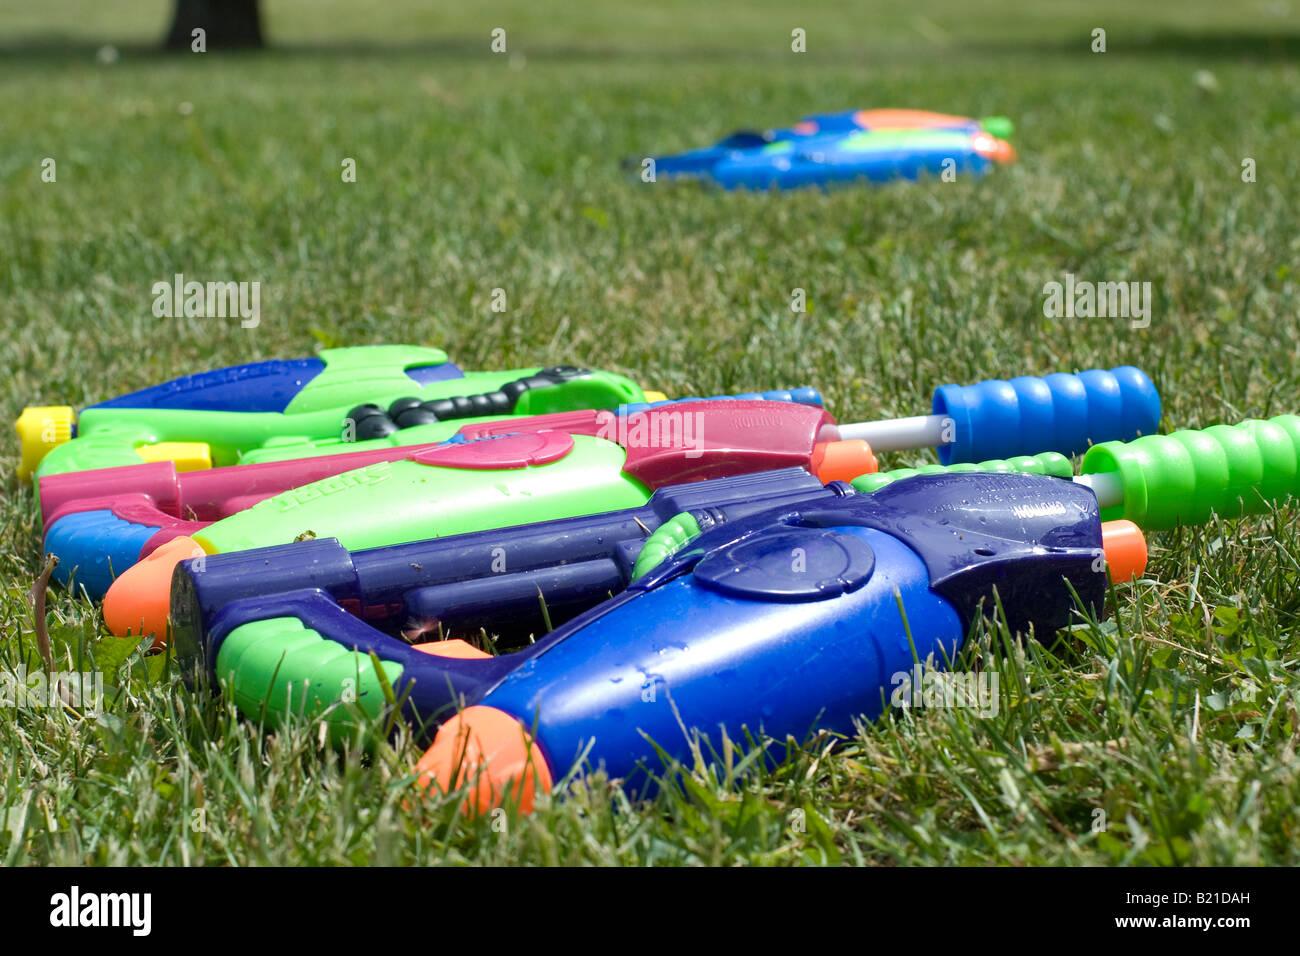 Squirt guns lay ready for children's squirt gun battle - Stock Image